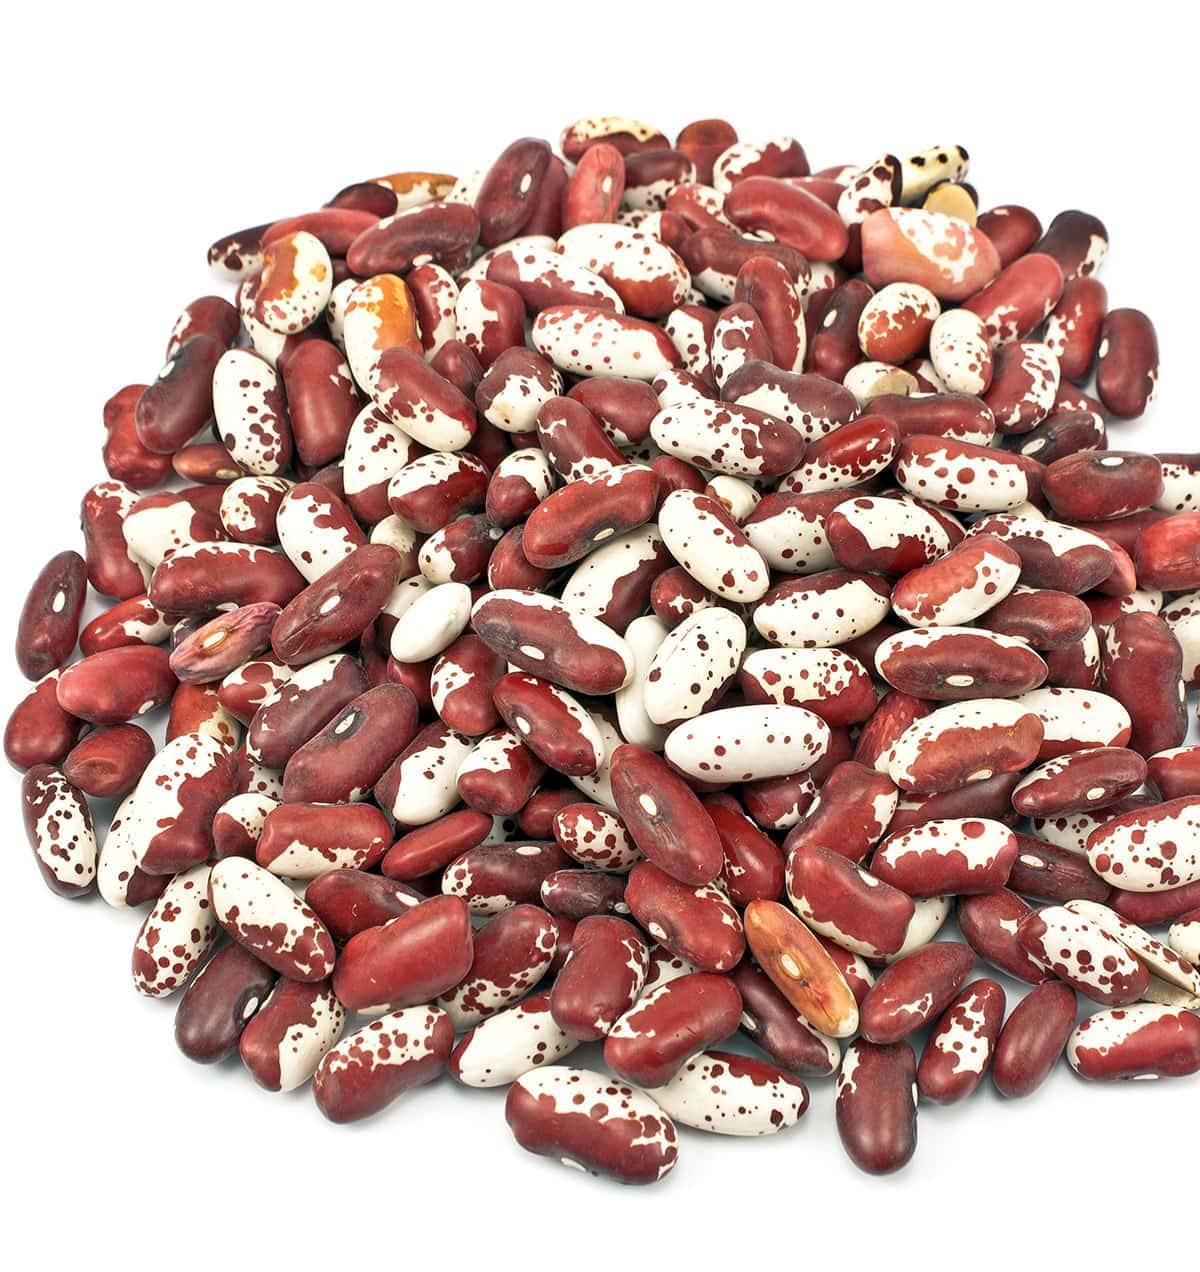 Whole anasazi beans on a white background